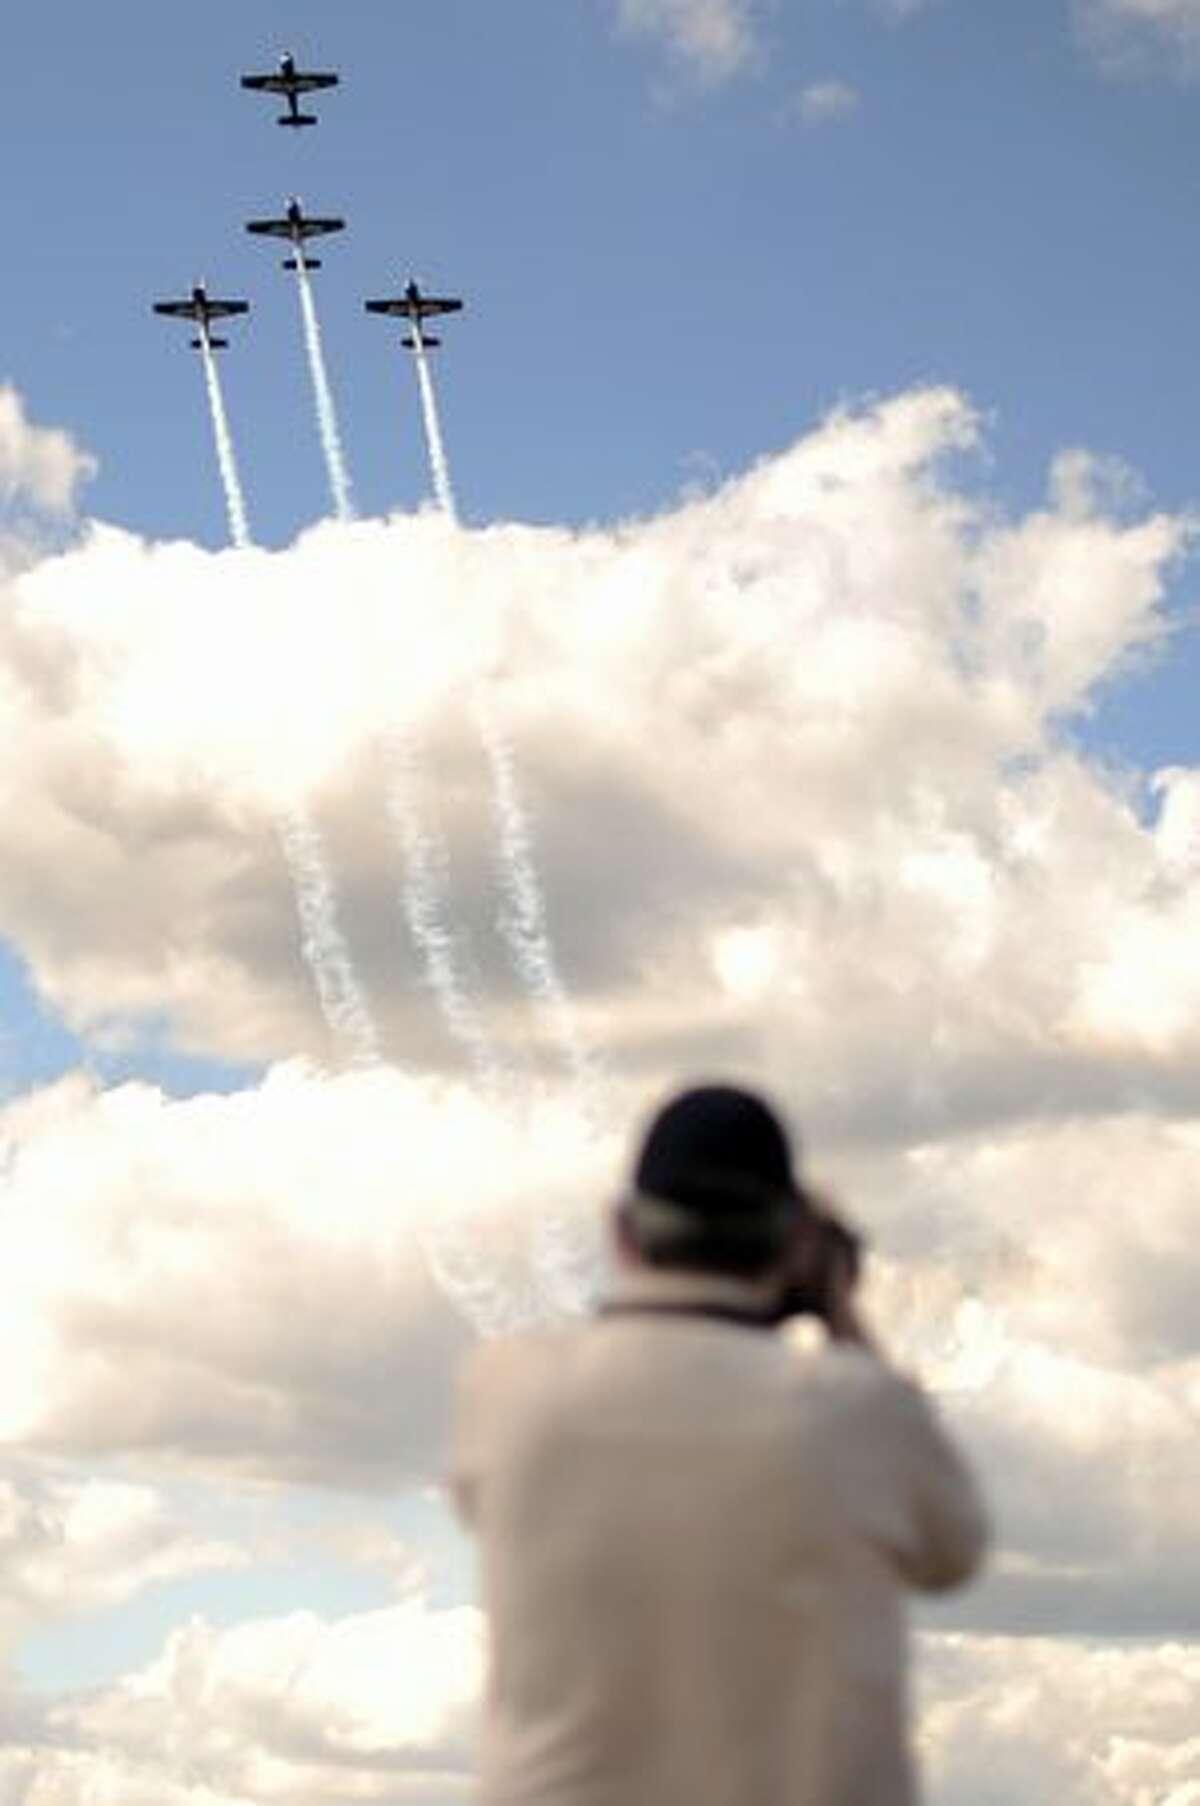 A spectator watches as the Blades aerobatic team perform during an air display at the Farnborough International Airshow, in Farnborough, England.